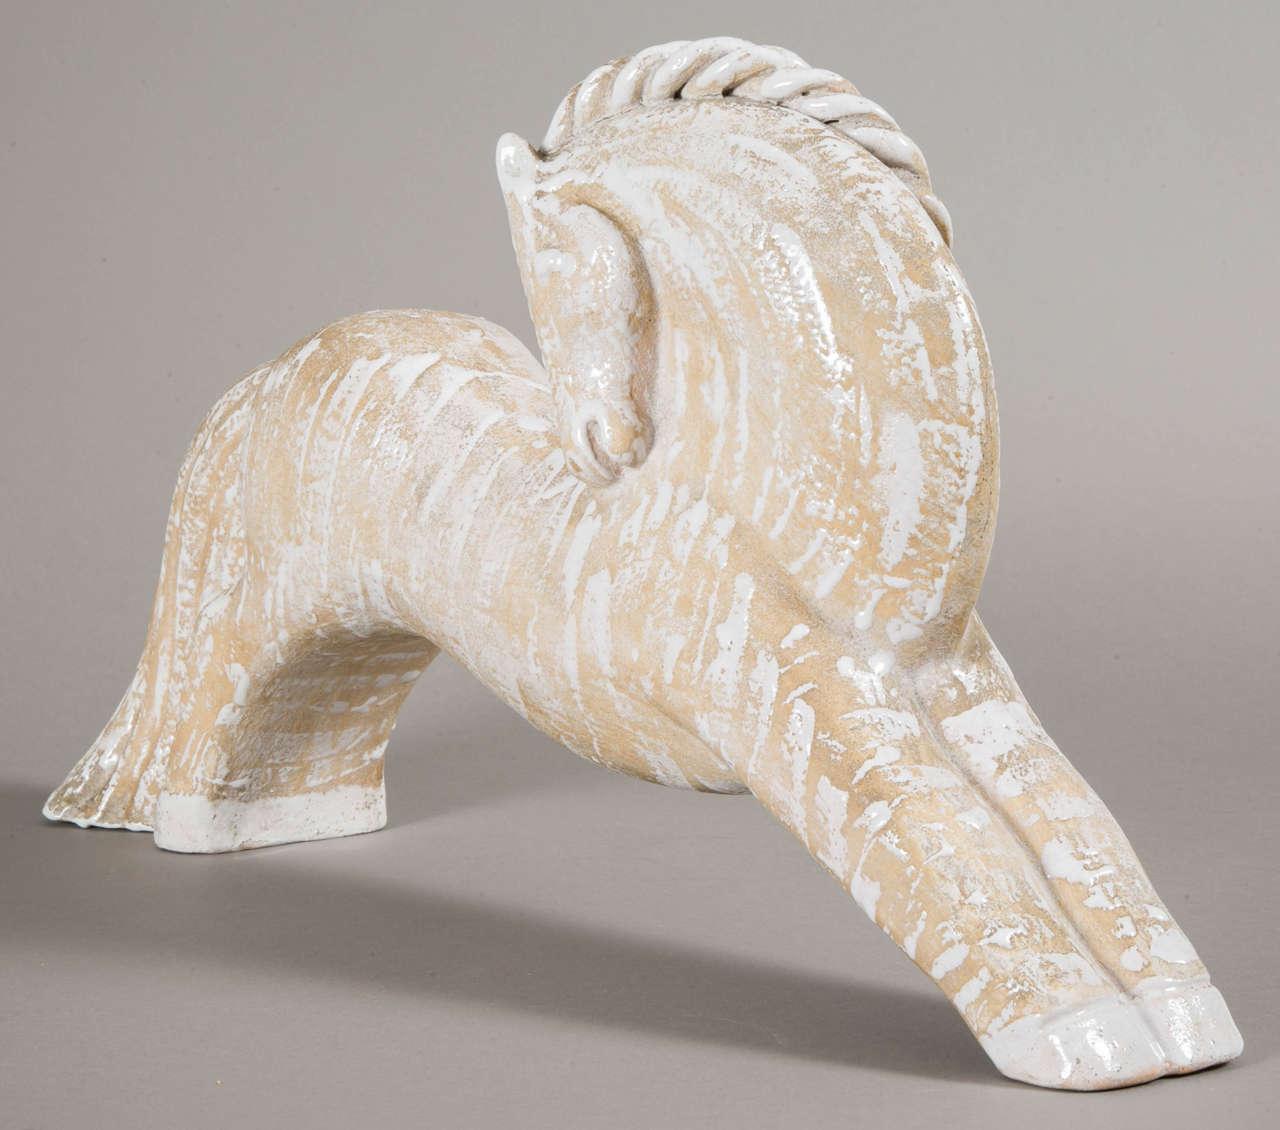 Primavera, circa 1938. Atelier du Printemps. Elegant stylized beige enamelled terracotta horse. Signed Primavera, Made in France.  Reference: One similar model seen in the movie Ninotchka, E.Lubitsch, 1939. In the spirit of̀ Colette Gueden.